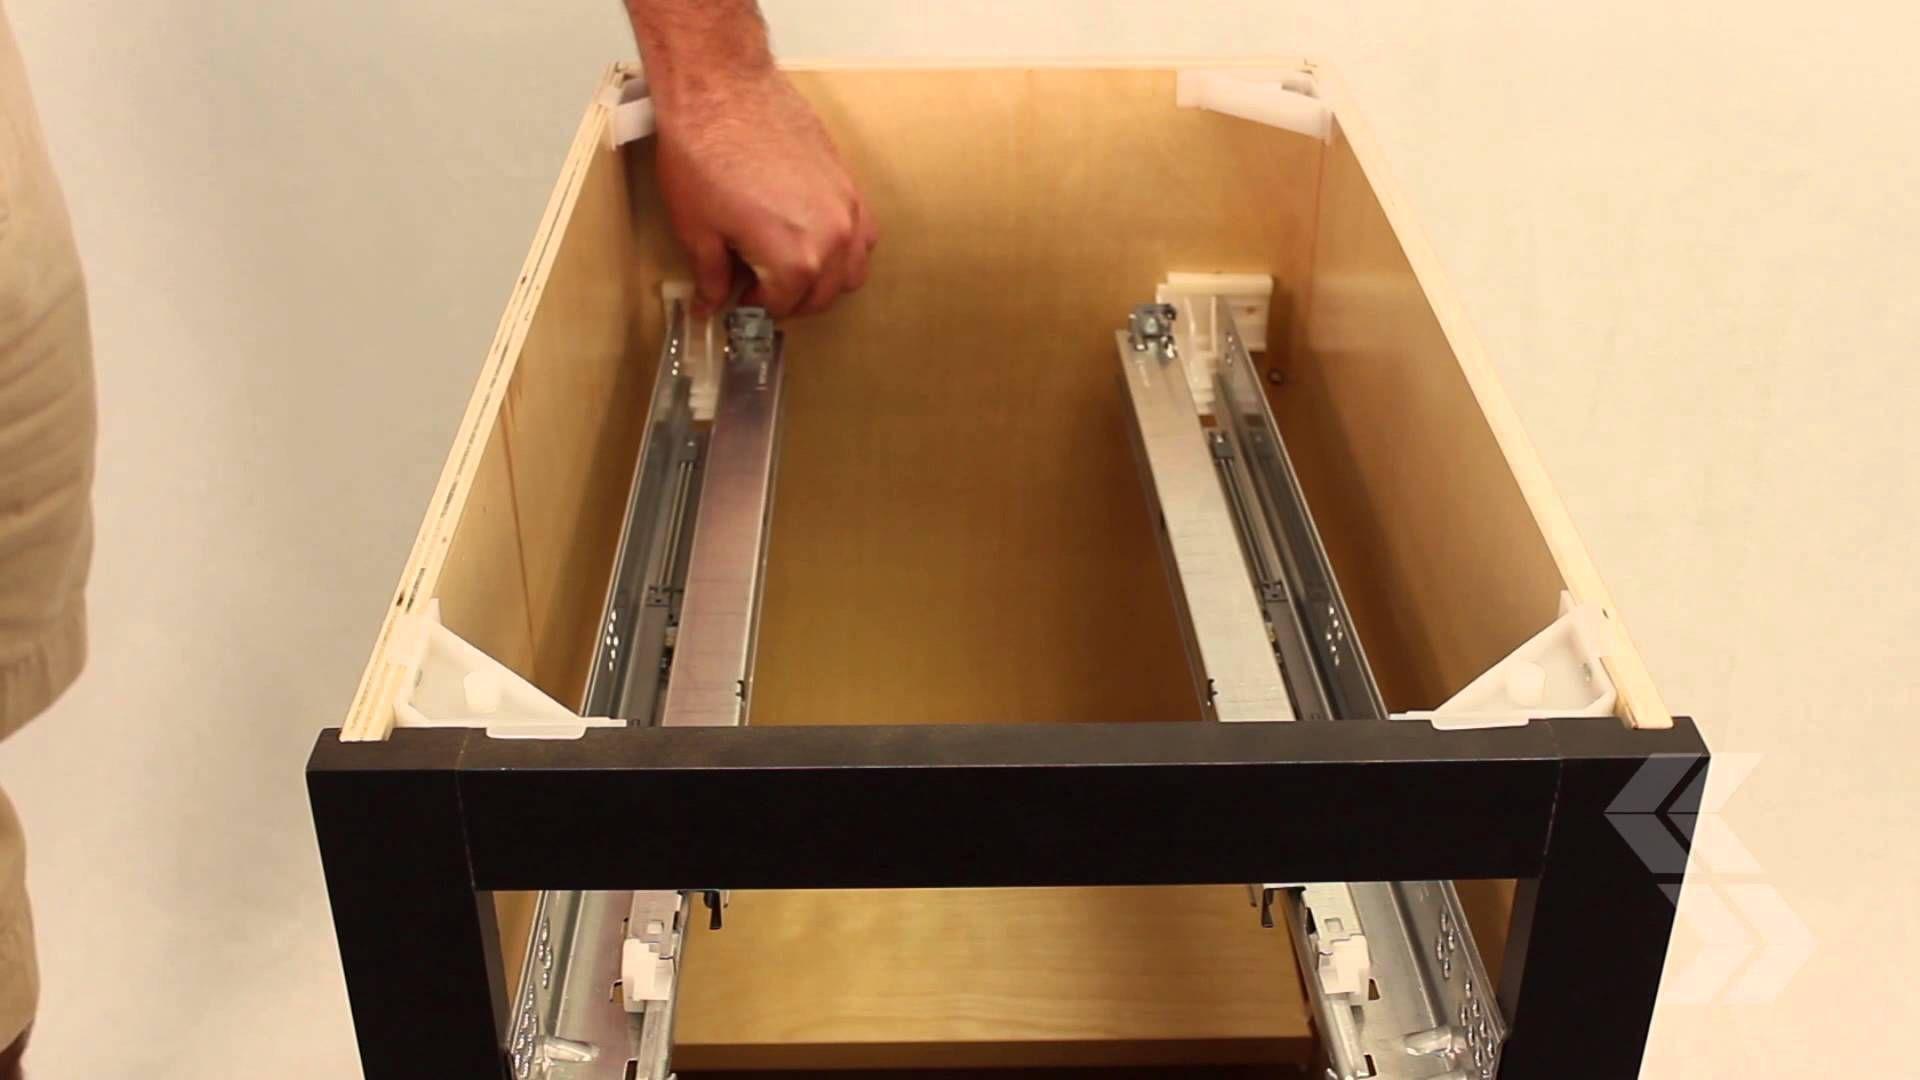 Cabinet Drawer Adjustment For Soft Close Drawers Soft Close Drawer Slides Cabinet Drawers Soft Close Drawers